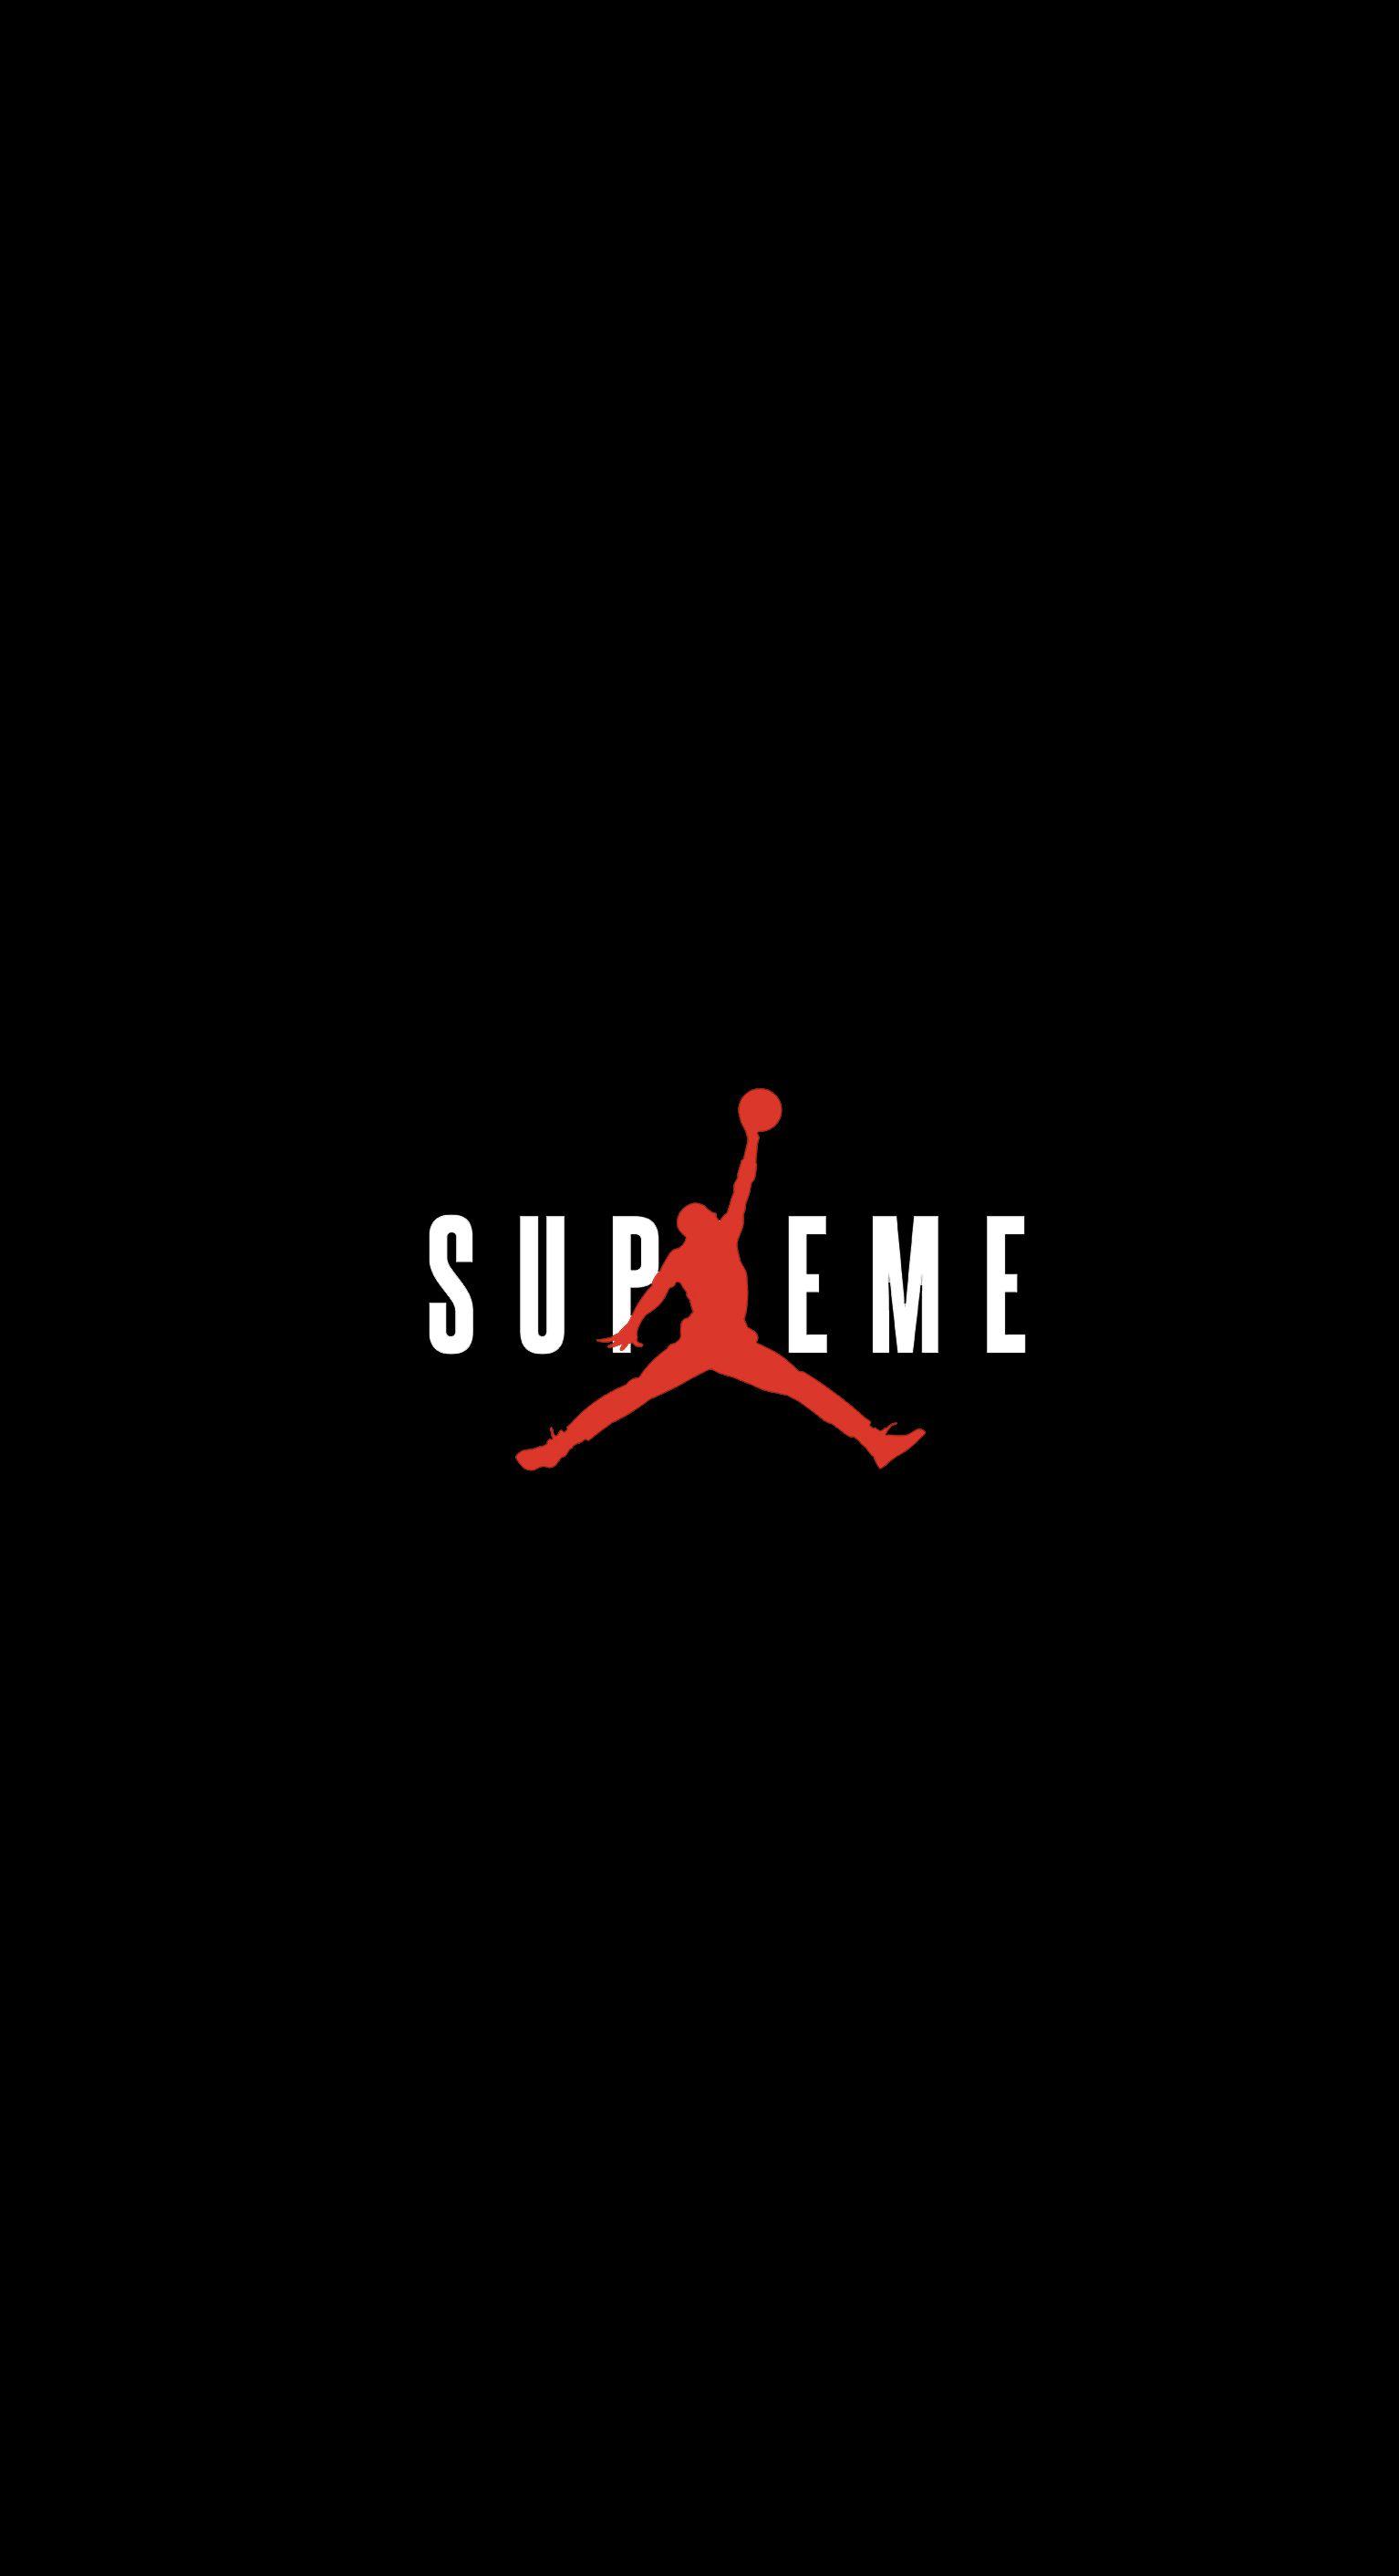 Iphone 6 wallpaper tumblr drake - Supreme X Jordan Wallpaper Streetwear Streetwear Wallpapers Wallpaper Zone